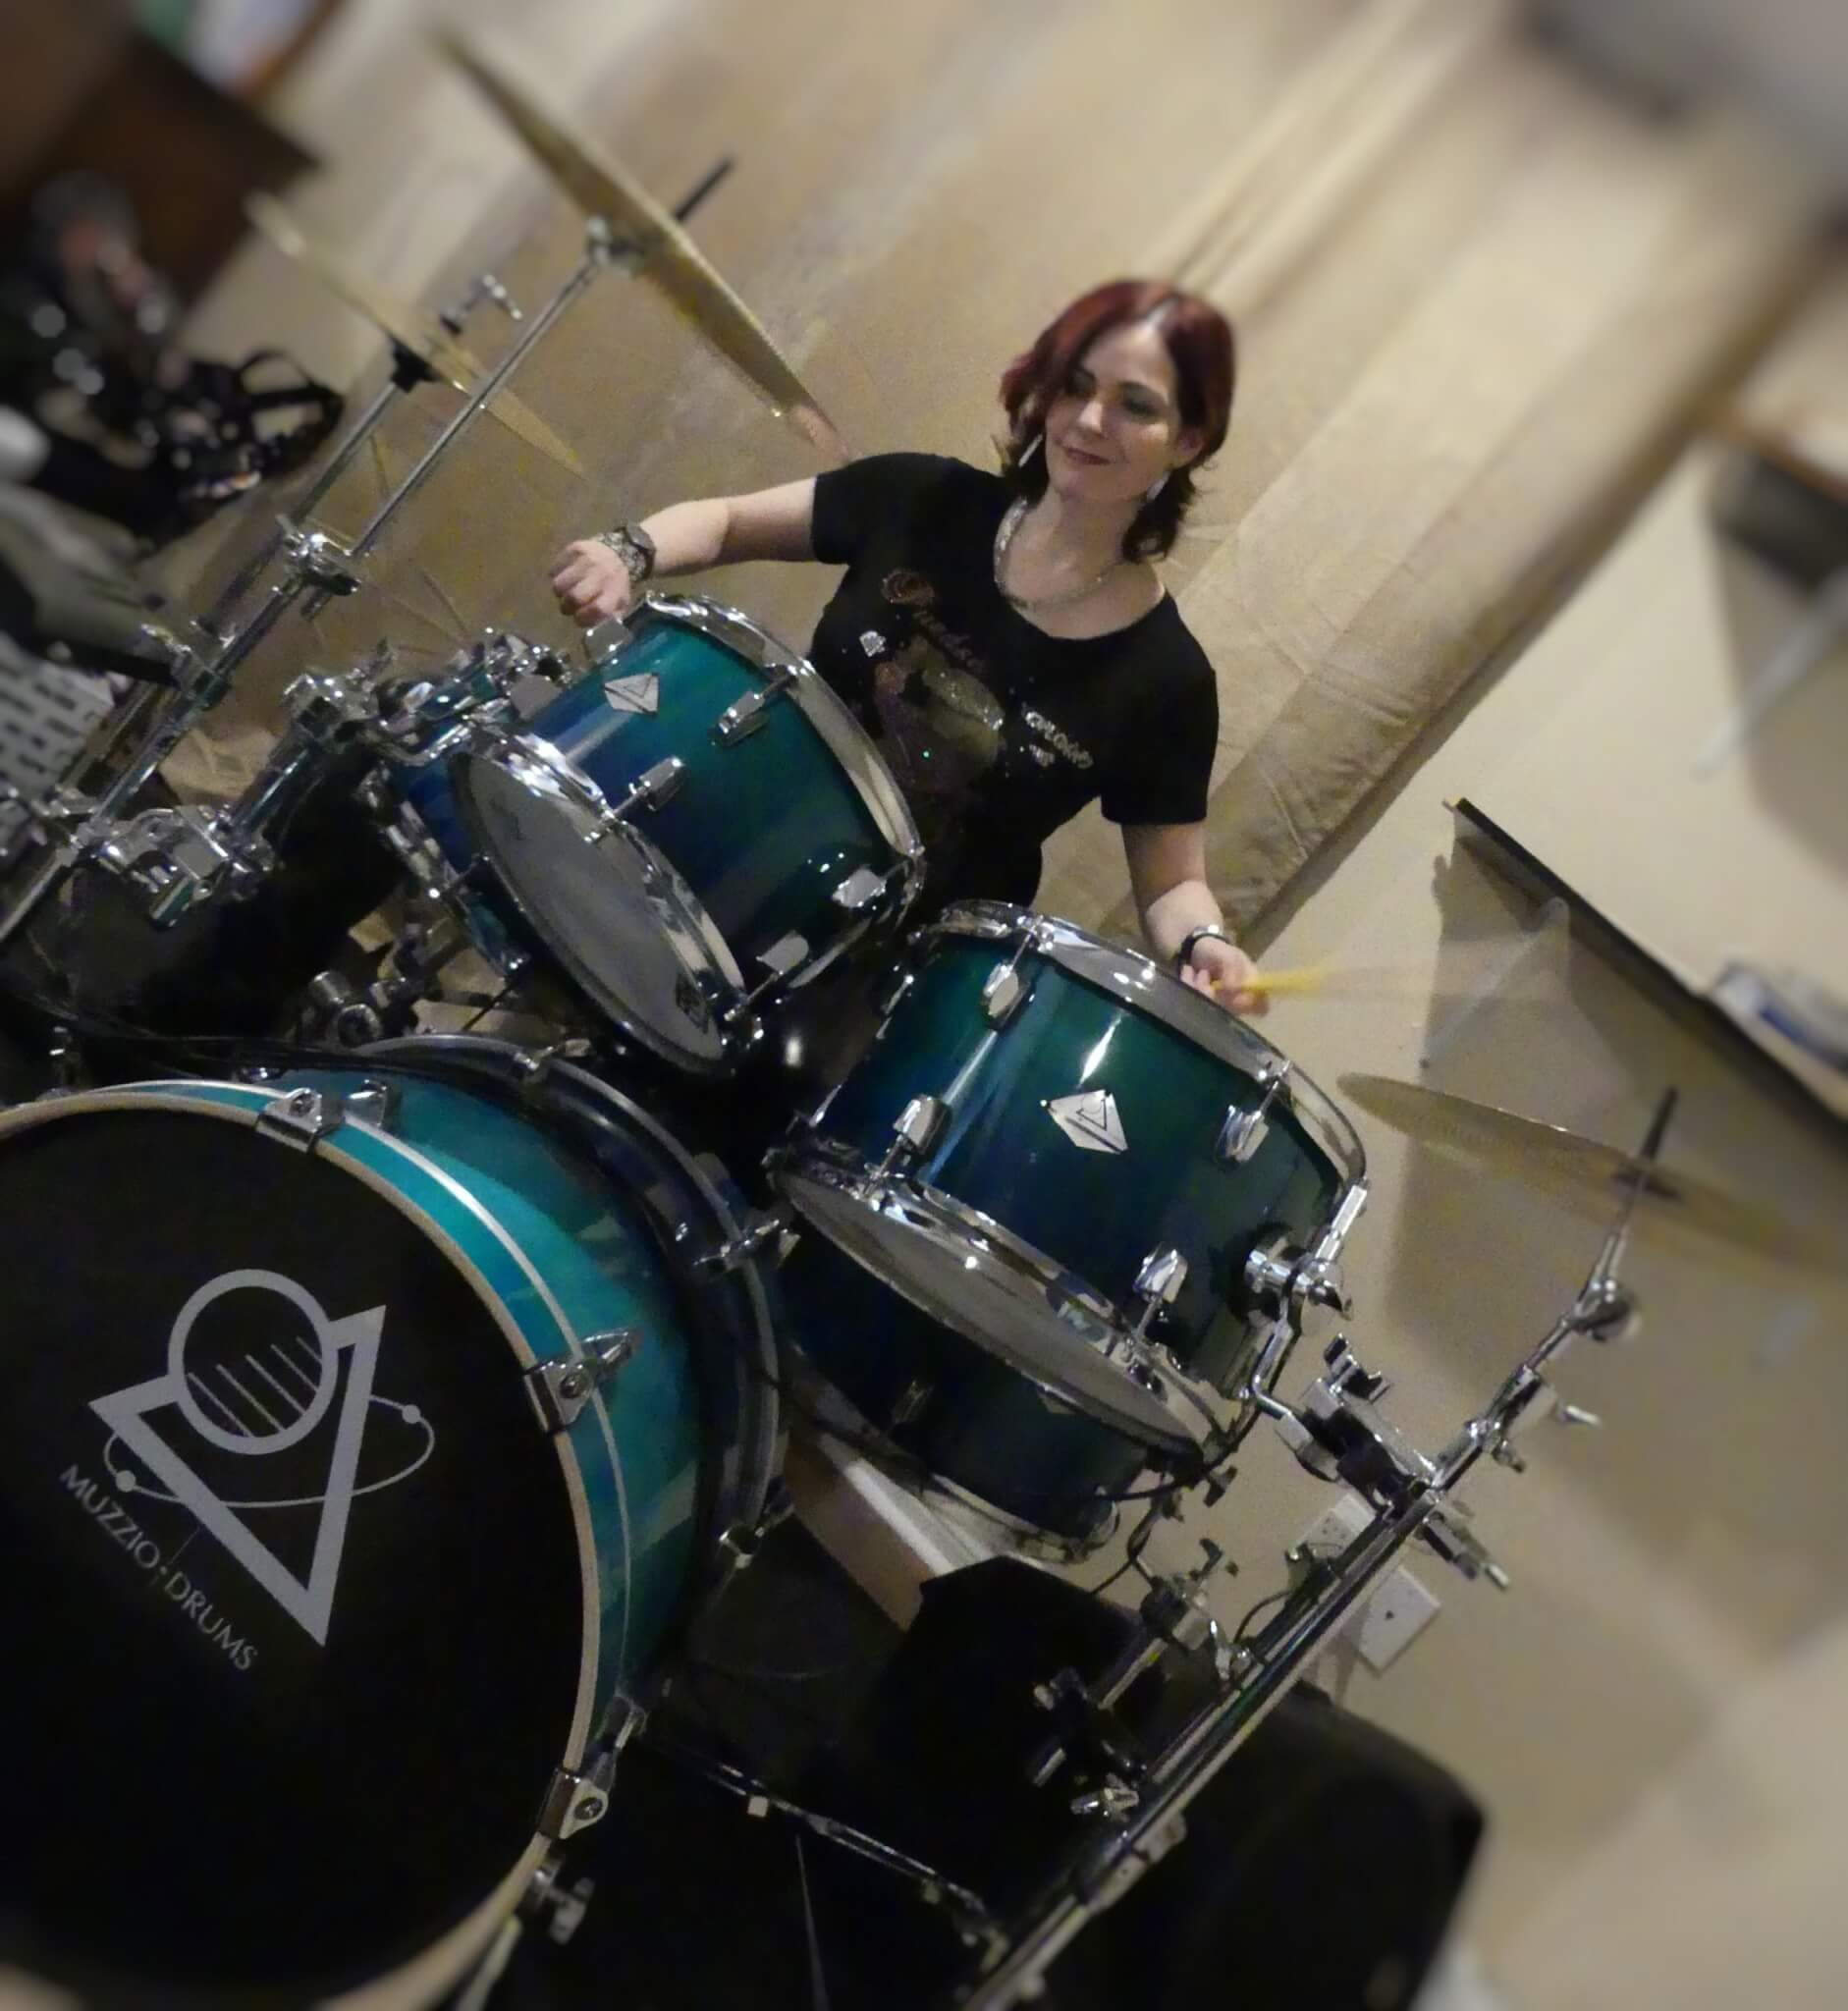 Cindy Goldberg playing drums